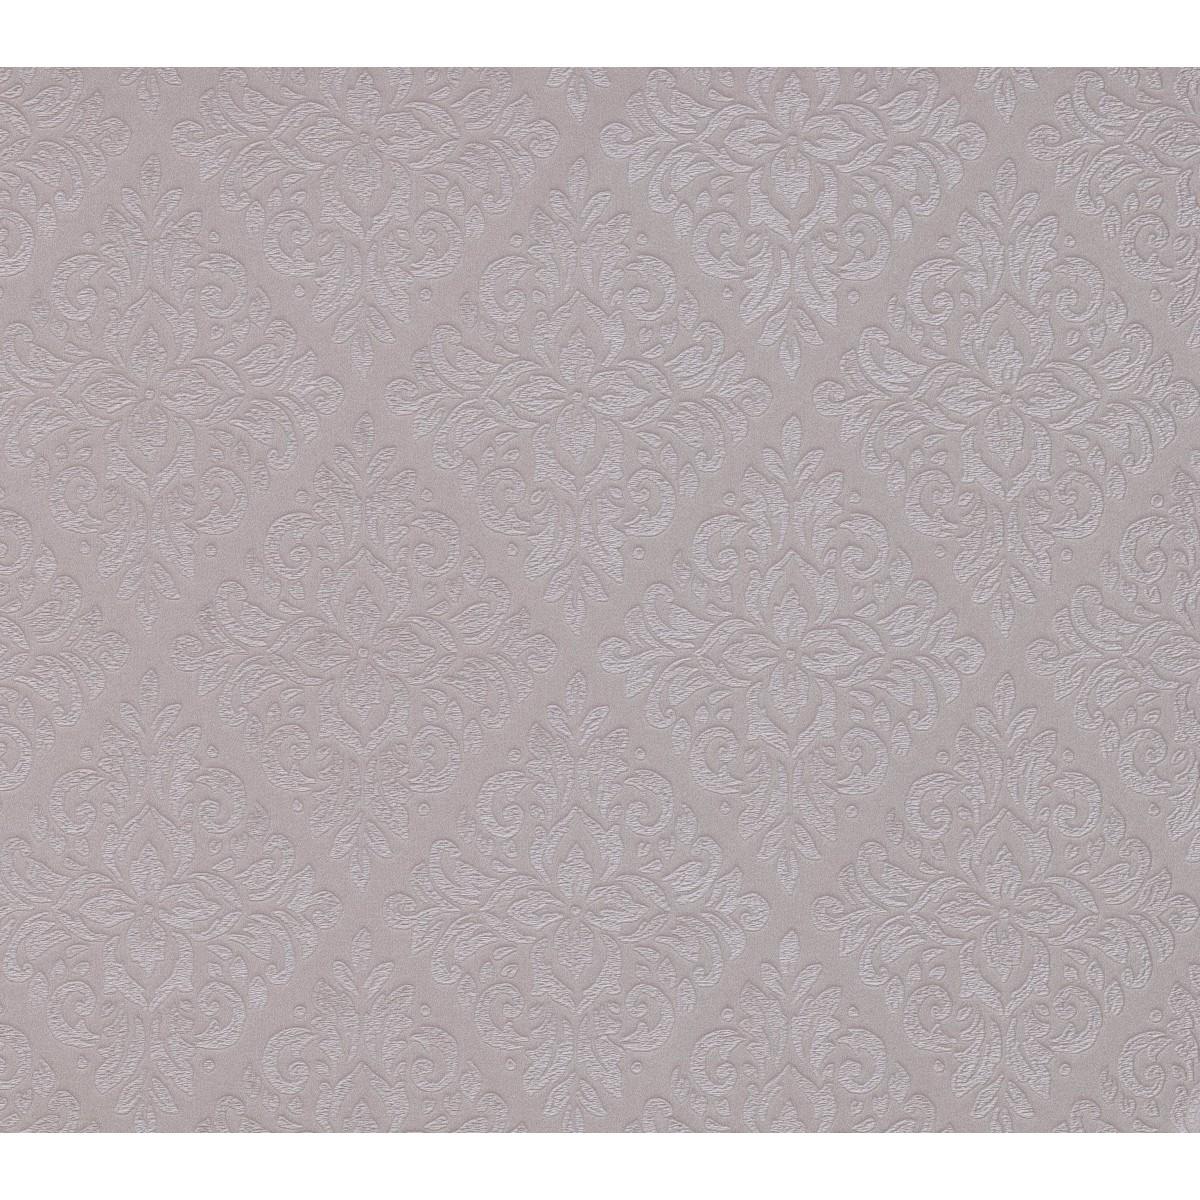 Обои флизелиновые Limonta Italian Wall Couture Camea серые 1.06 м 78007